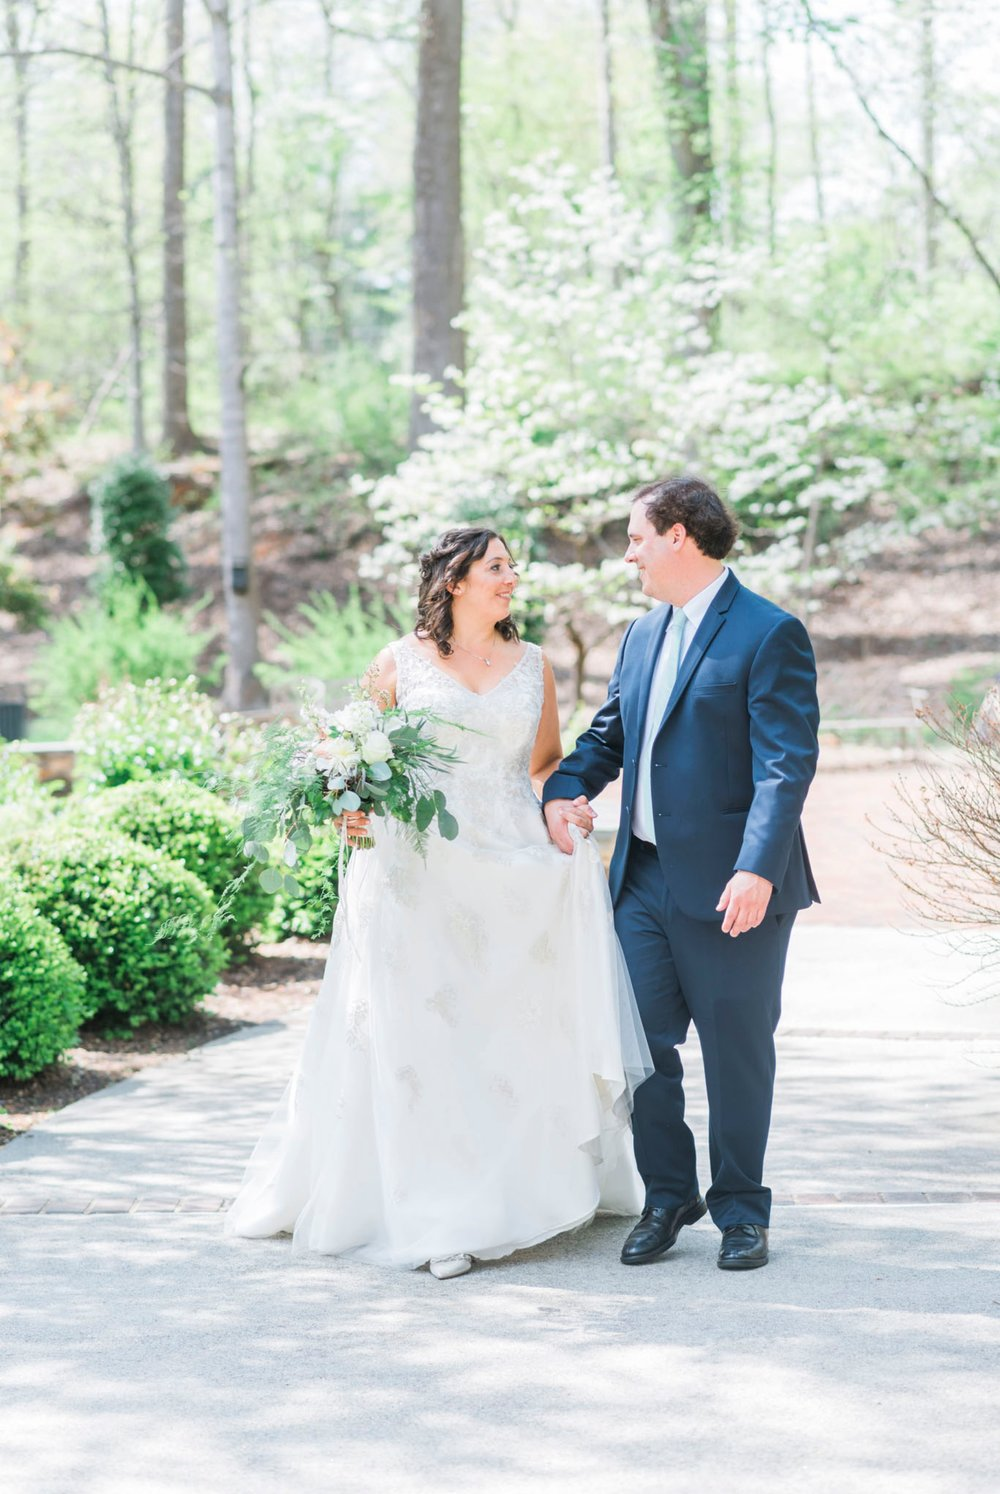 TheVirginianHotel_LynchburgVA_TheVirginianHotelWedding_Virginiaweddingphotographer_Lynchburgvawedding 30.jpg